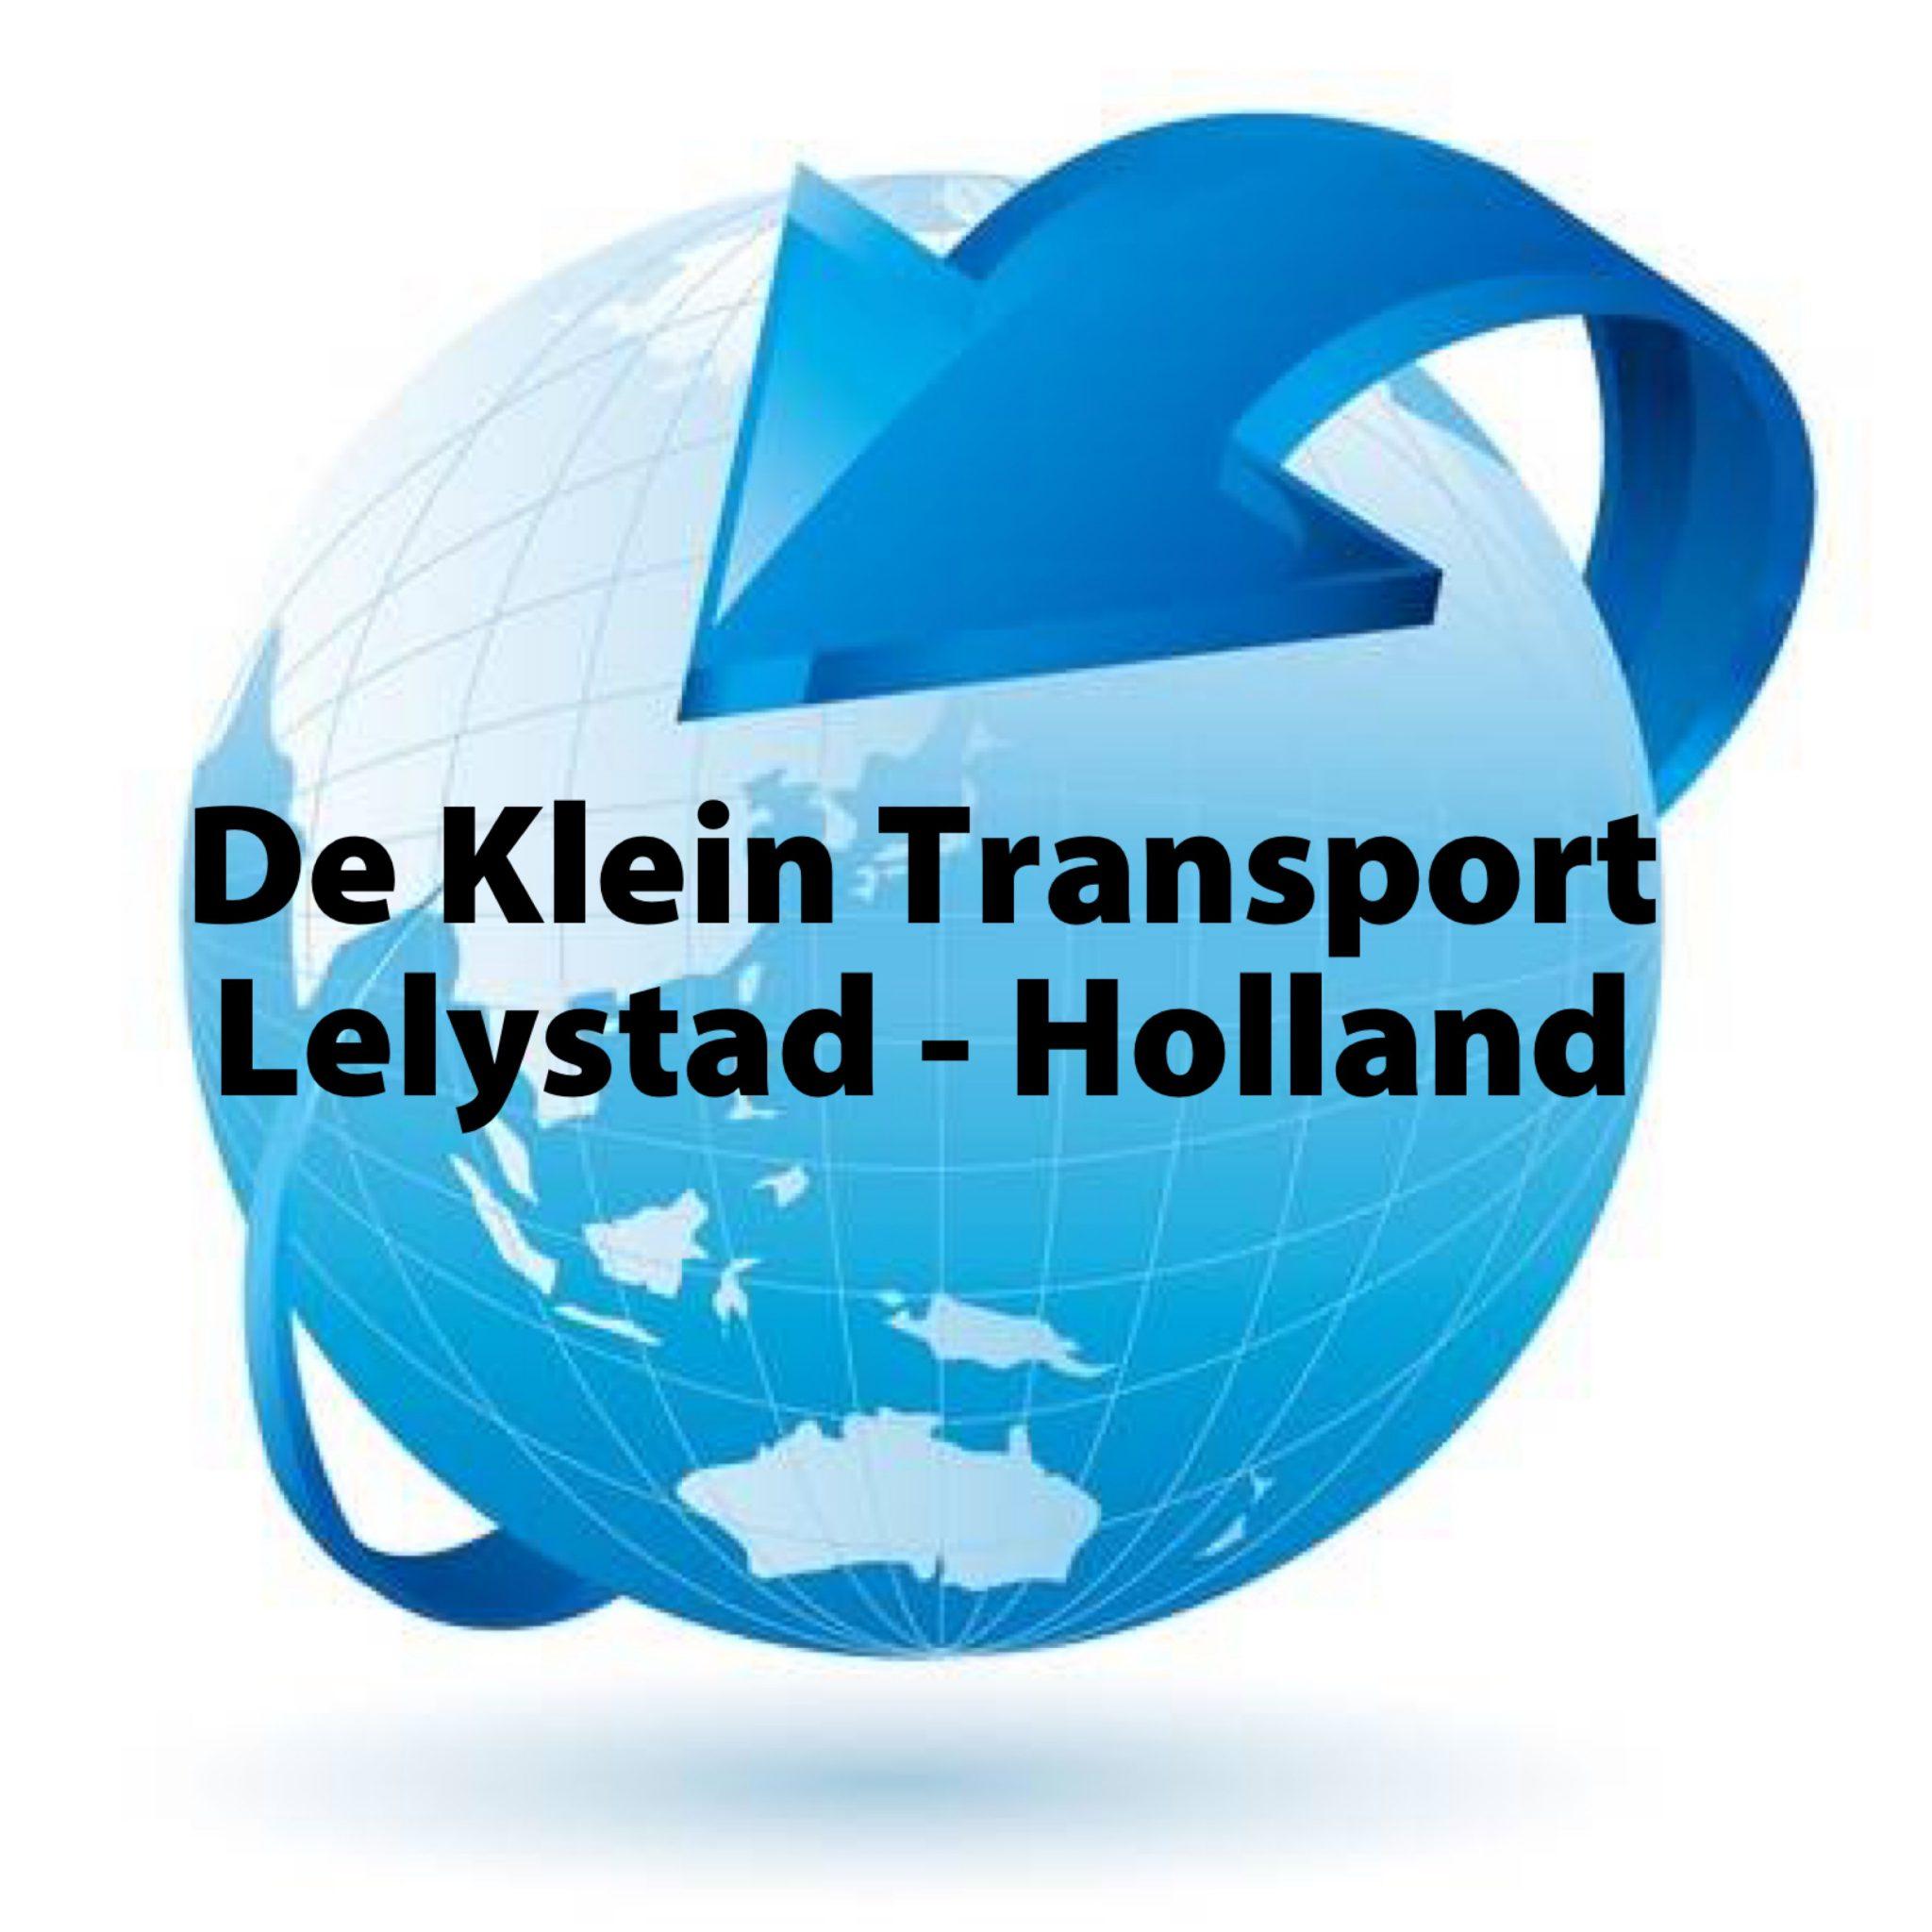 De Klein Transport